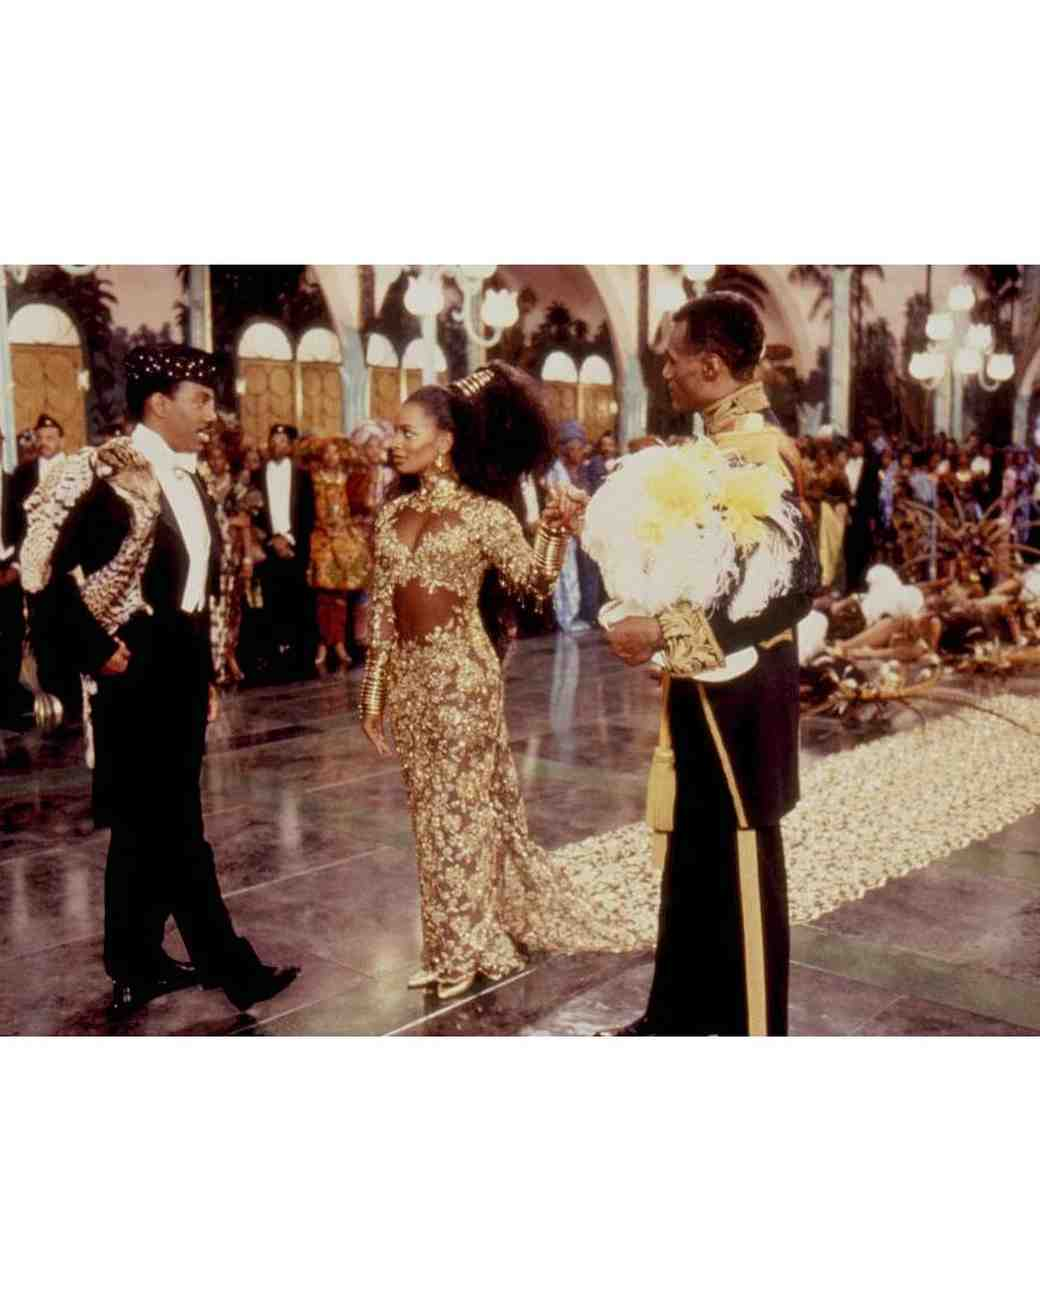 movie-wedding-dresses-coming-to-america-gold-vanessa-bell-calloway-0316.jpg